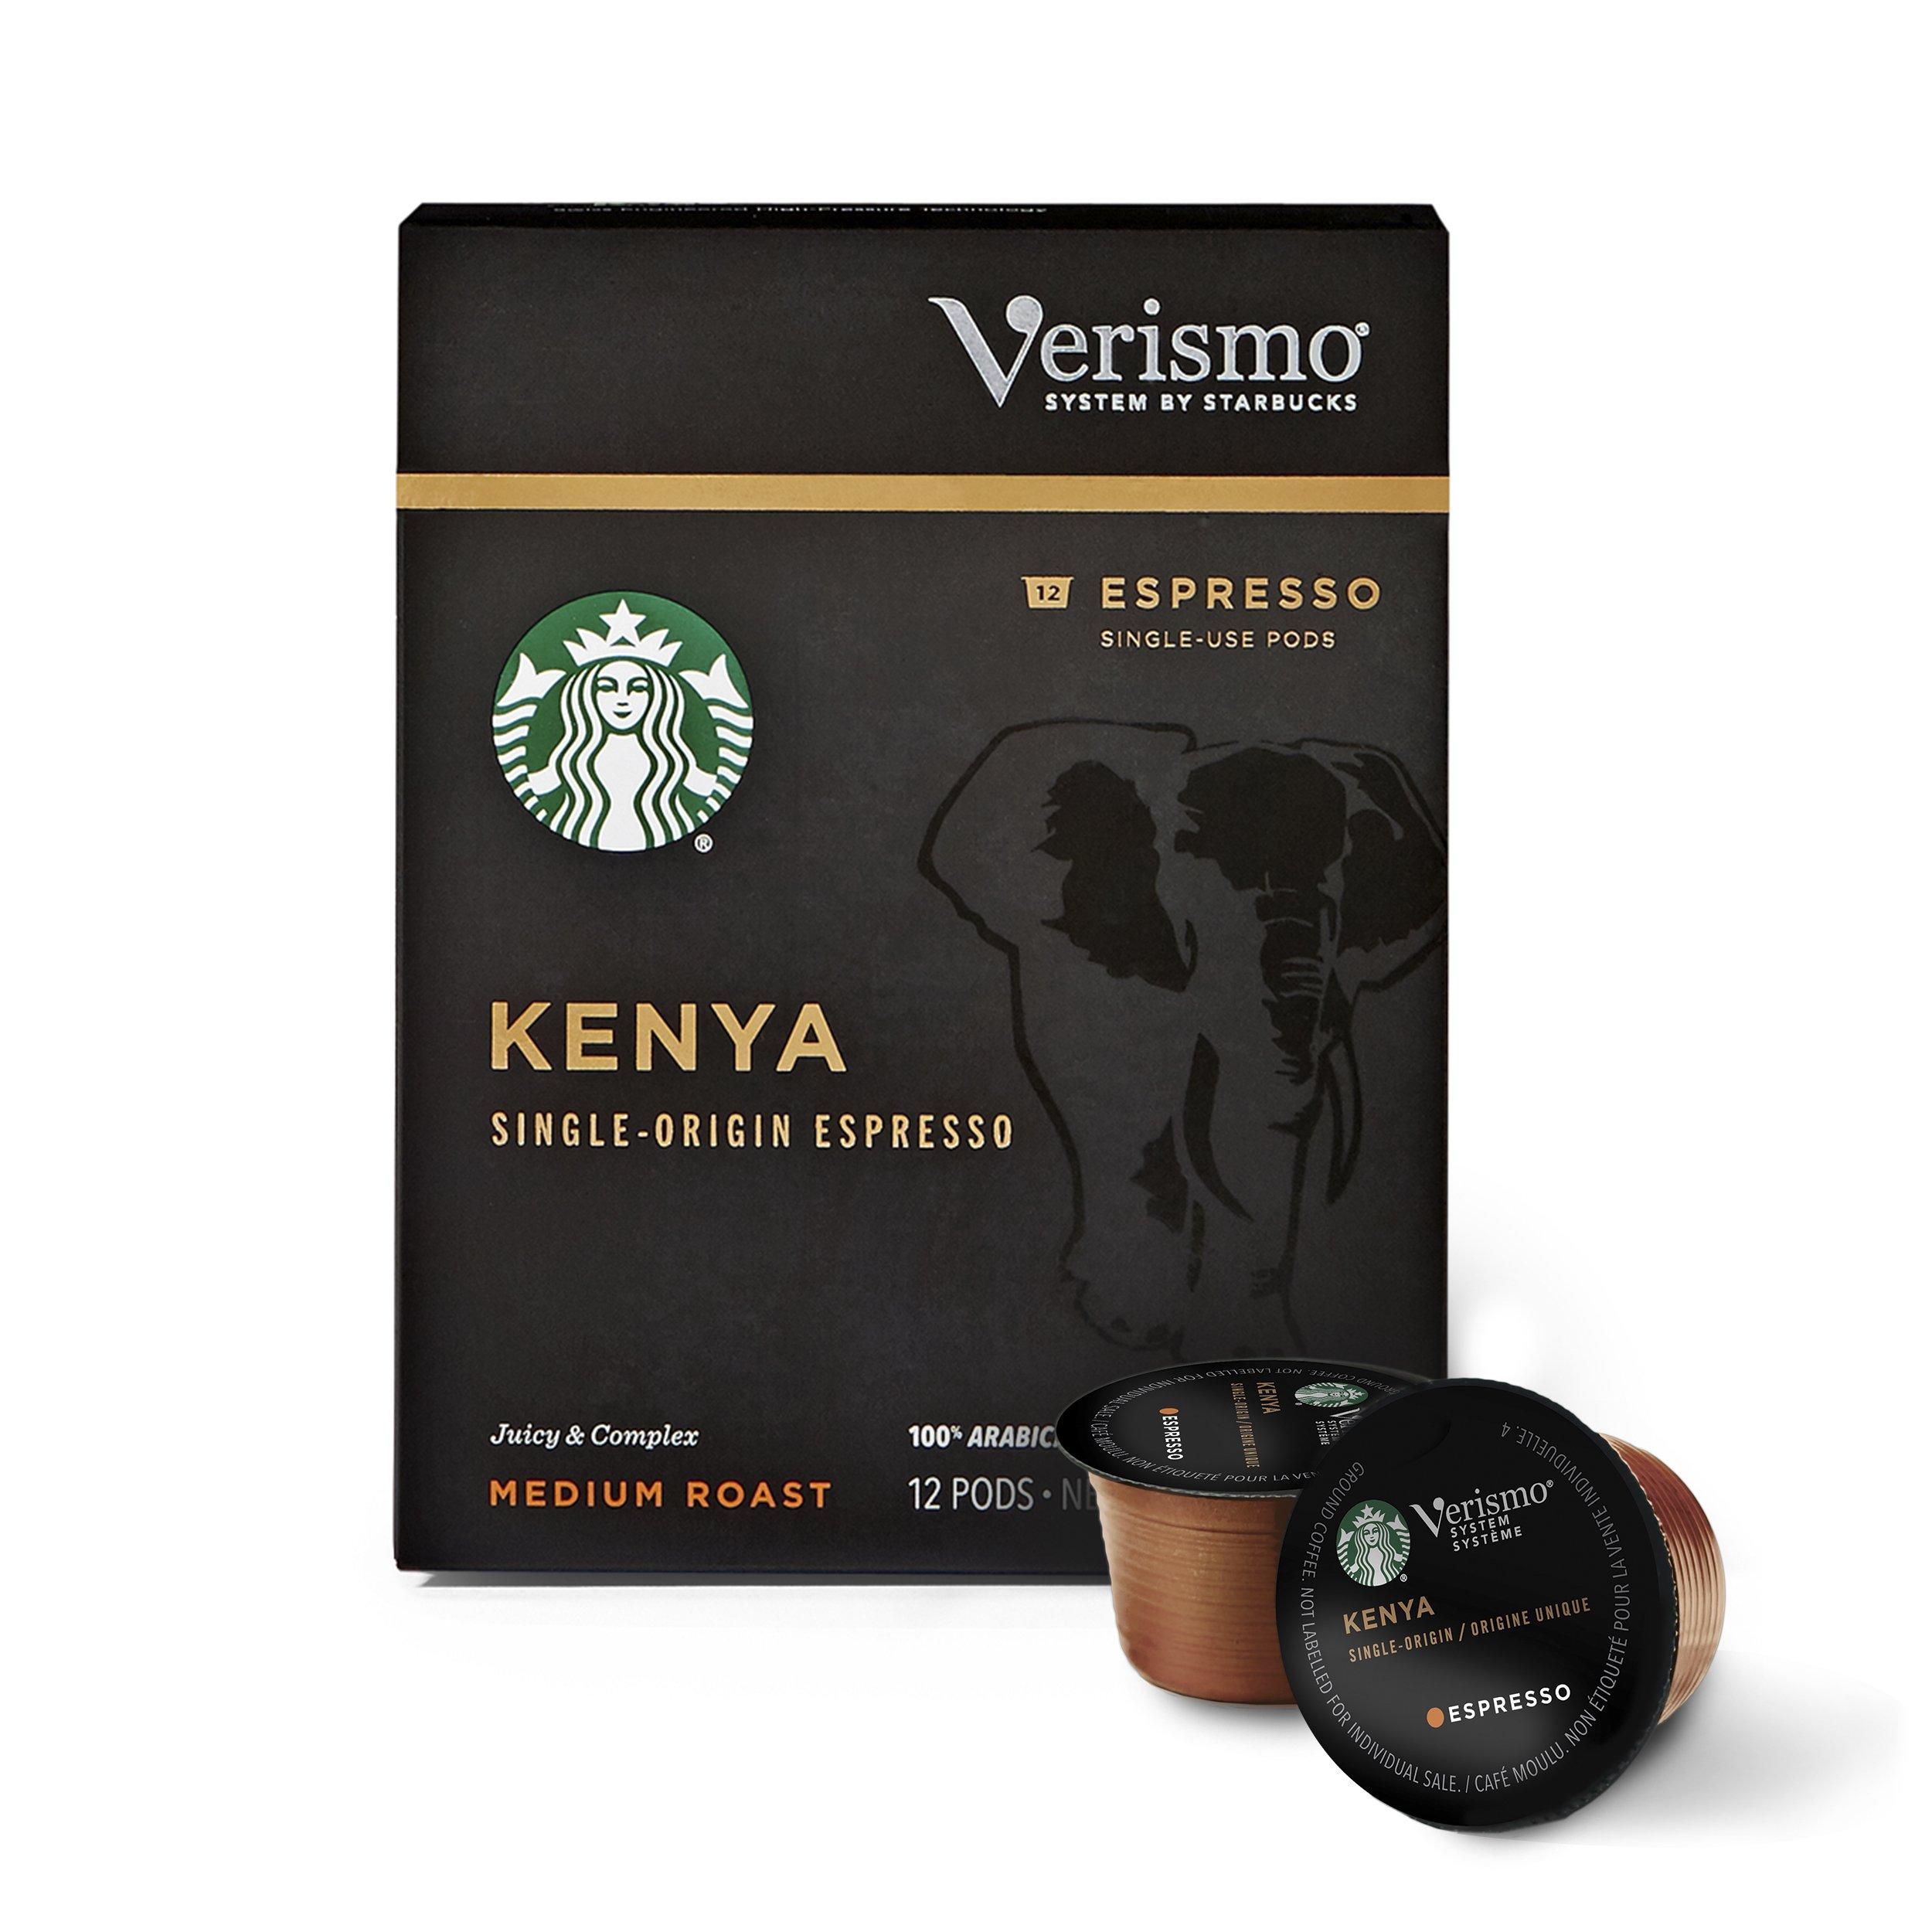 Starbucks Medium Roast Brewed Coffee Single-Serve Verismo Pods, Kenya Espresso, 72 Count